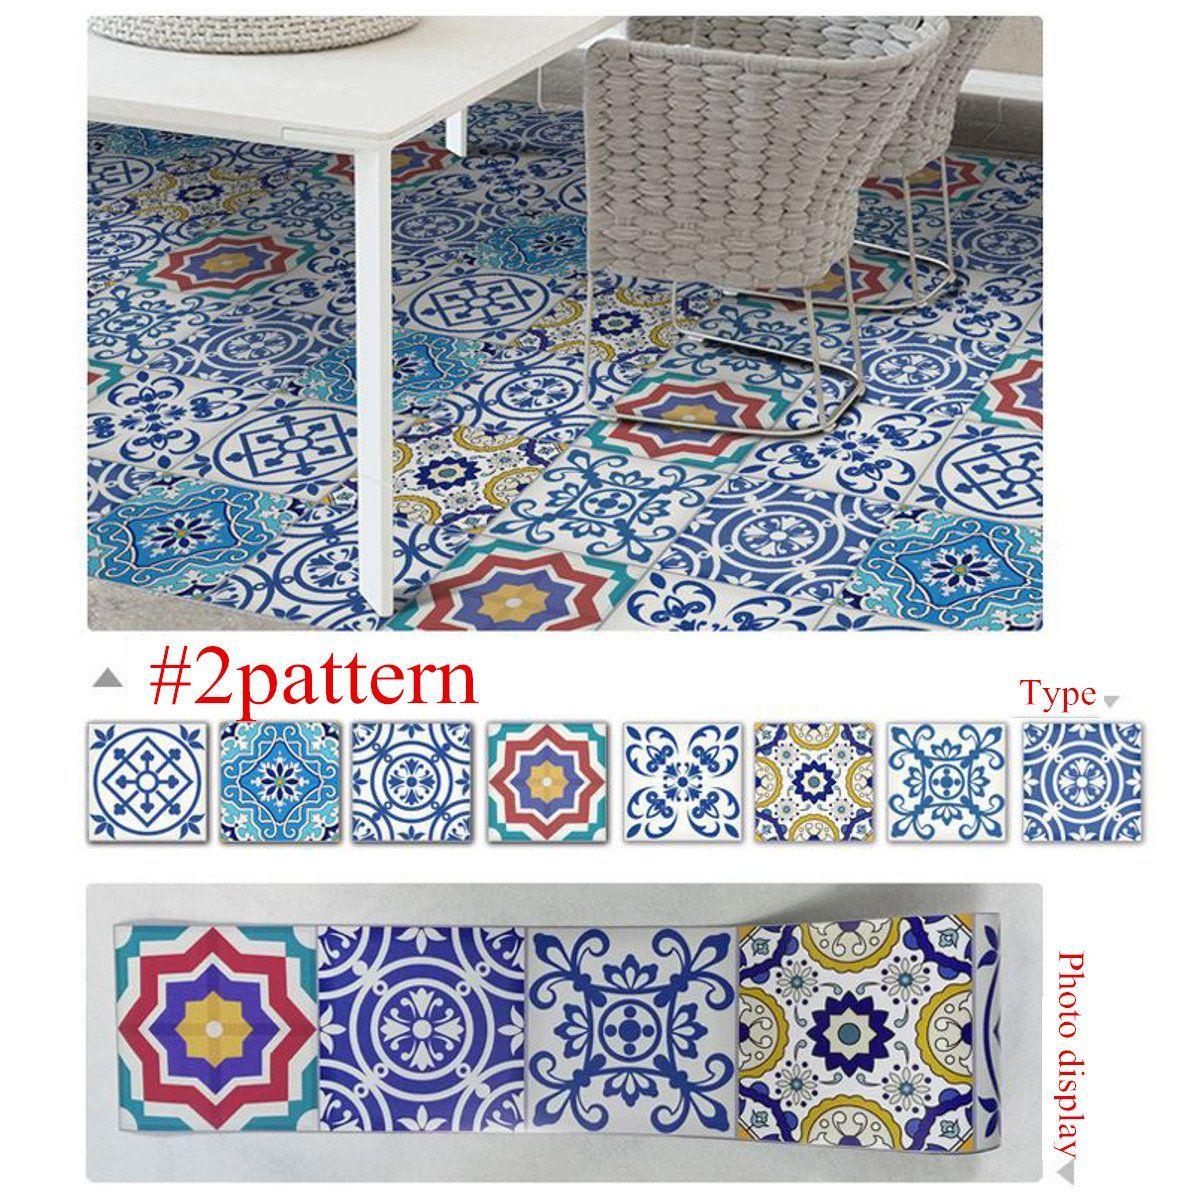 25pcs Self Adhesive Bohemia Simulation Ceramic Tiles Diy Kitchen Bathroom Wall Decal Stickers Decor Diy Tile Bathroom Wall Decals Ceramic Tiles